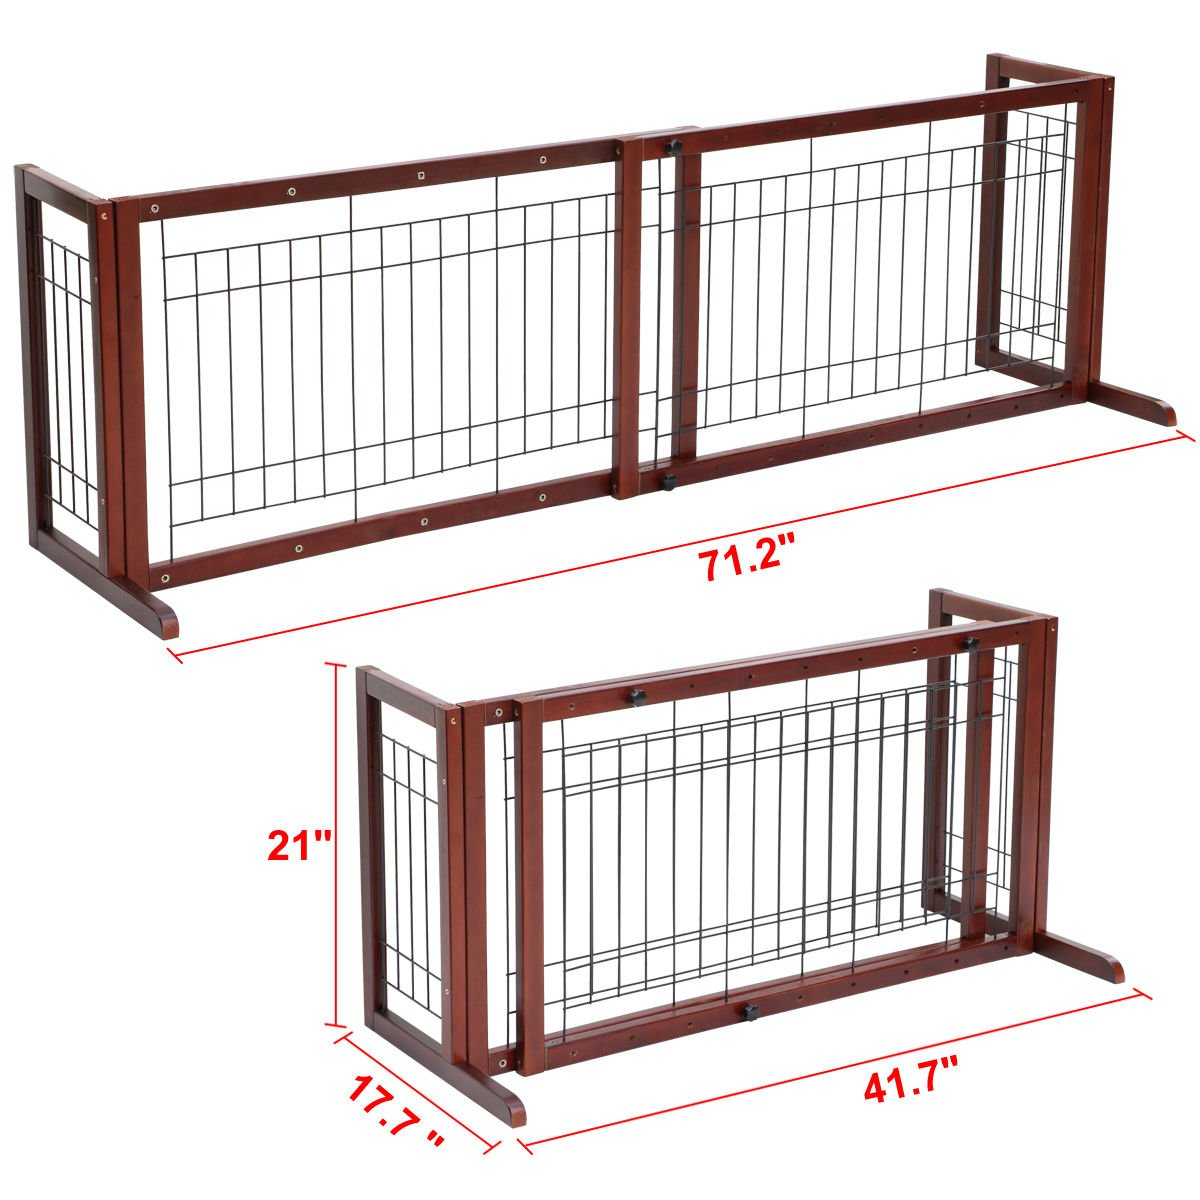 Tek Widget Adjustable Free Standing Indoor Dog Wood Gate/Fence by Tek Widget (Image #3)